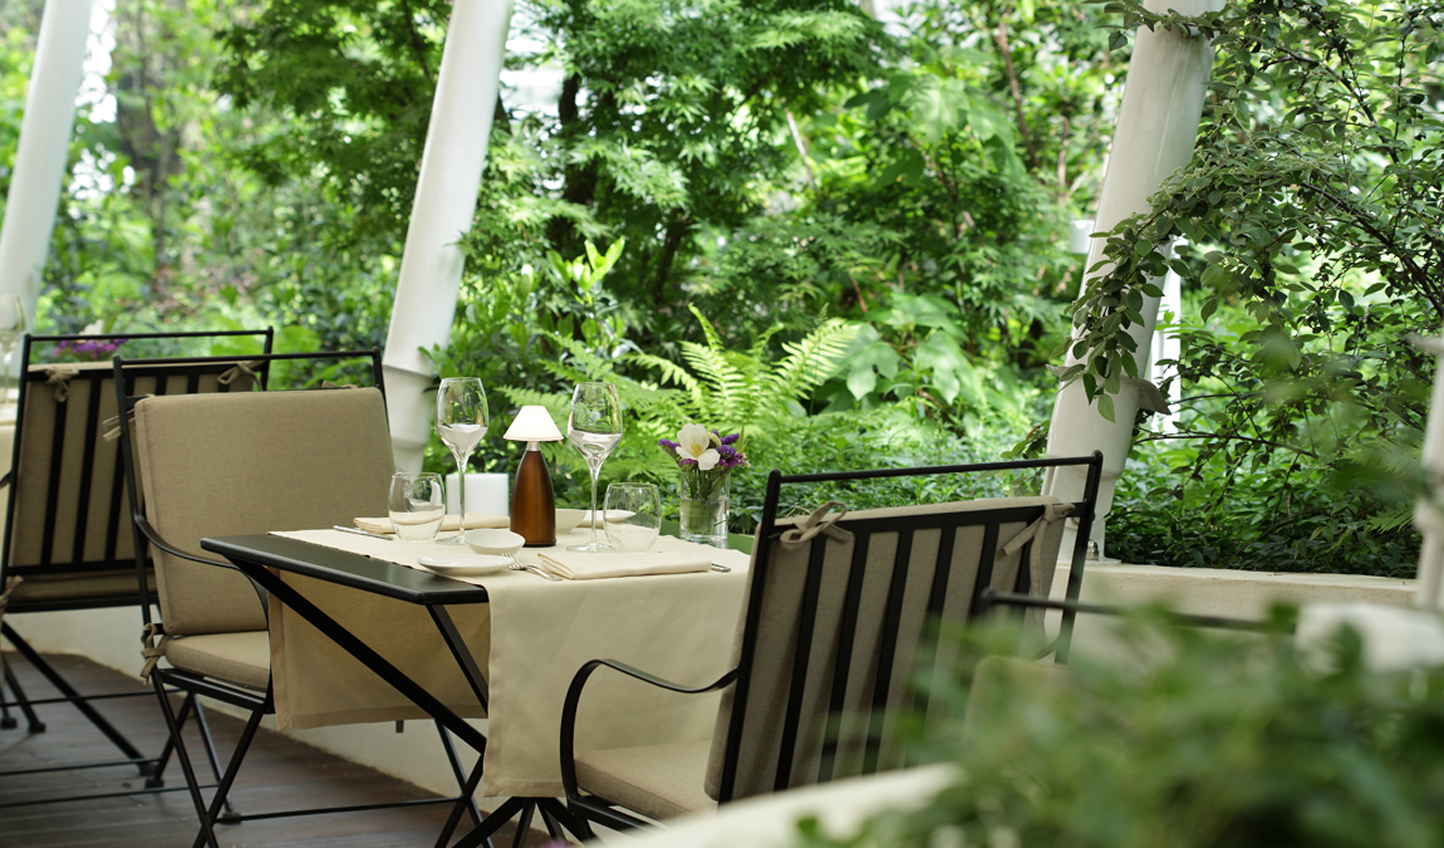 Dine out in the hidden garden